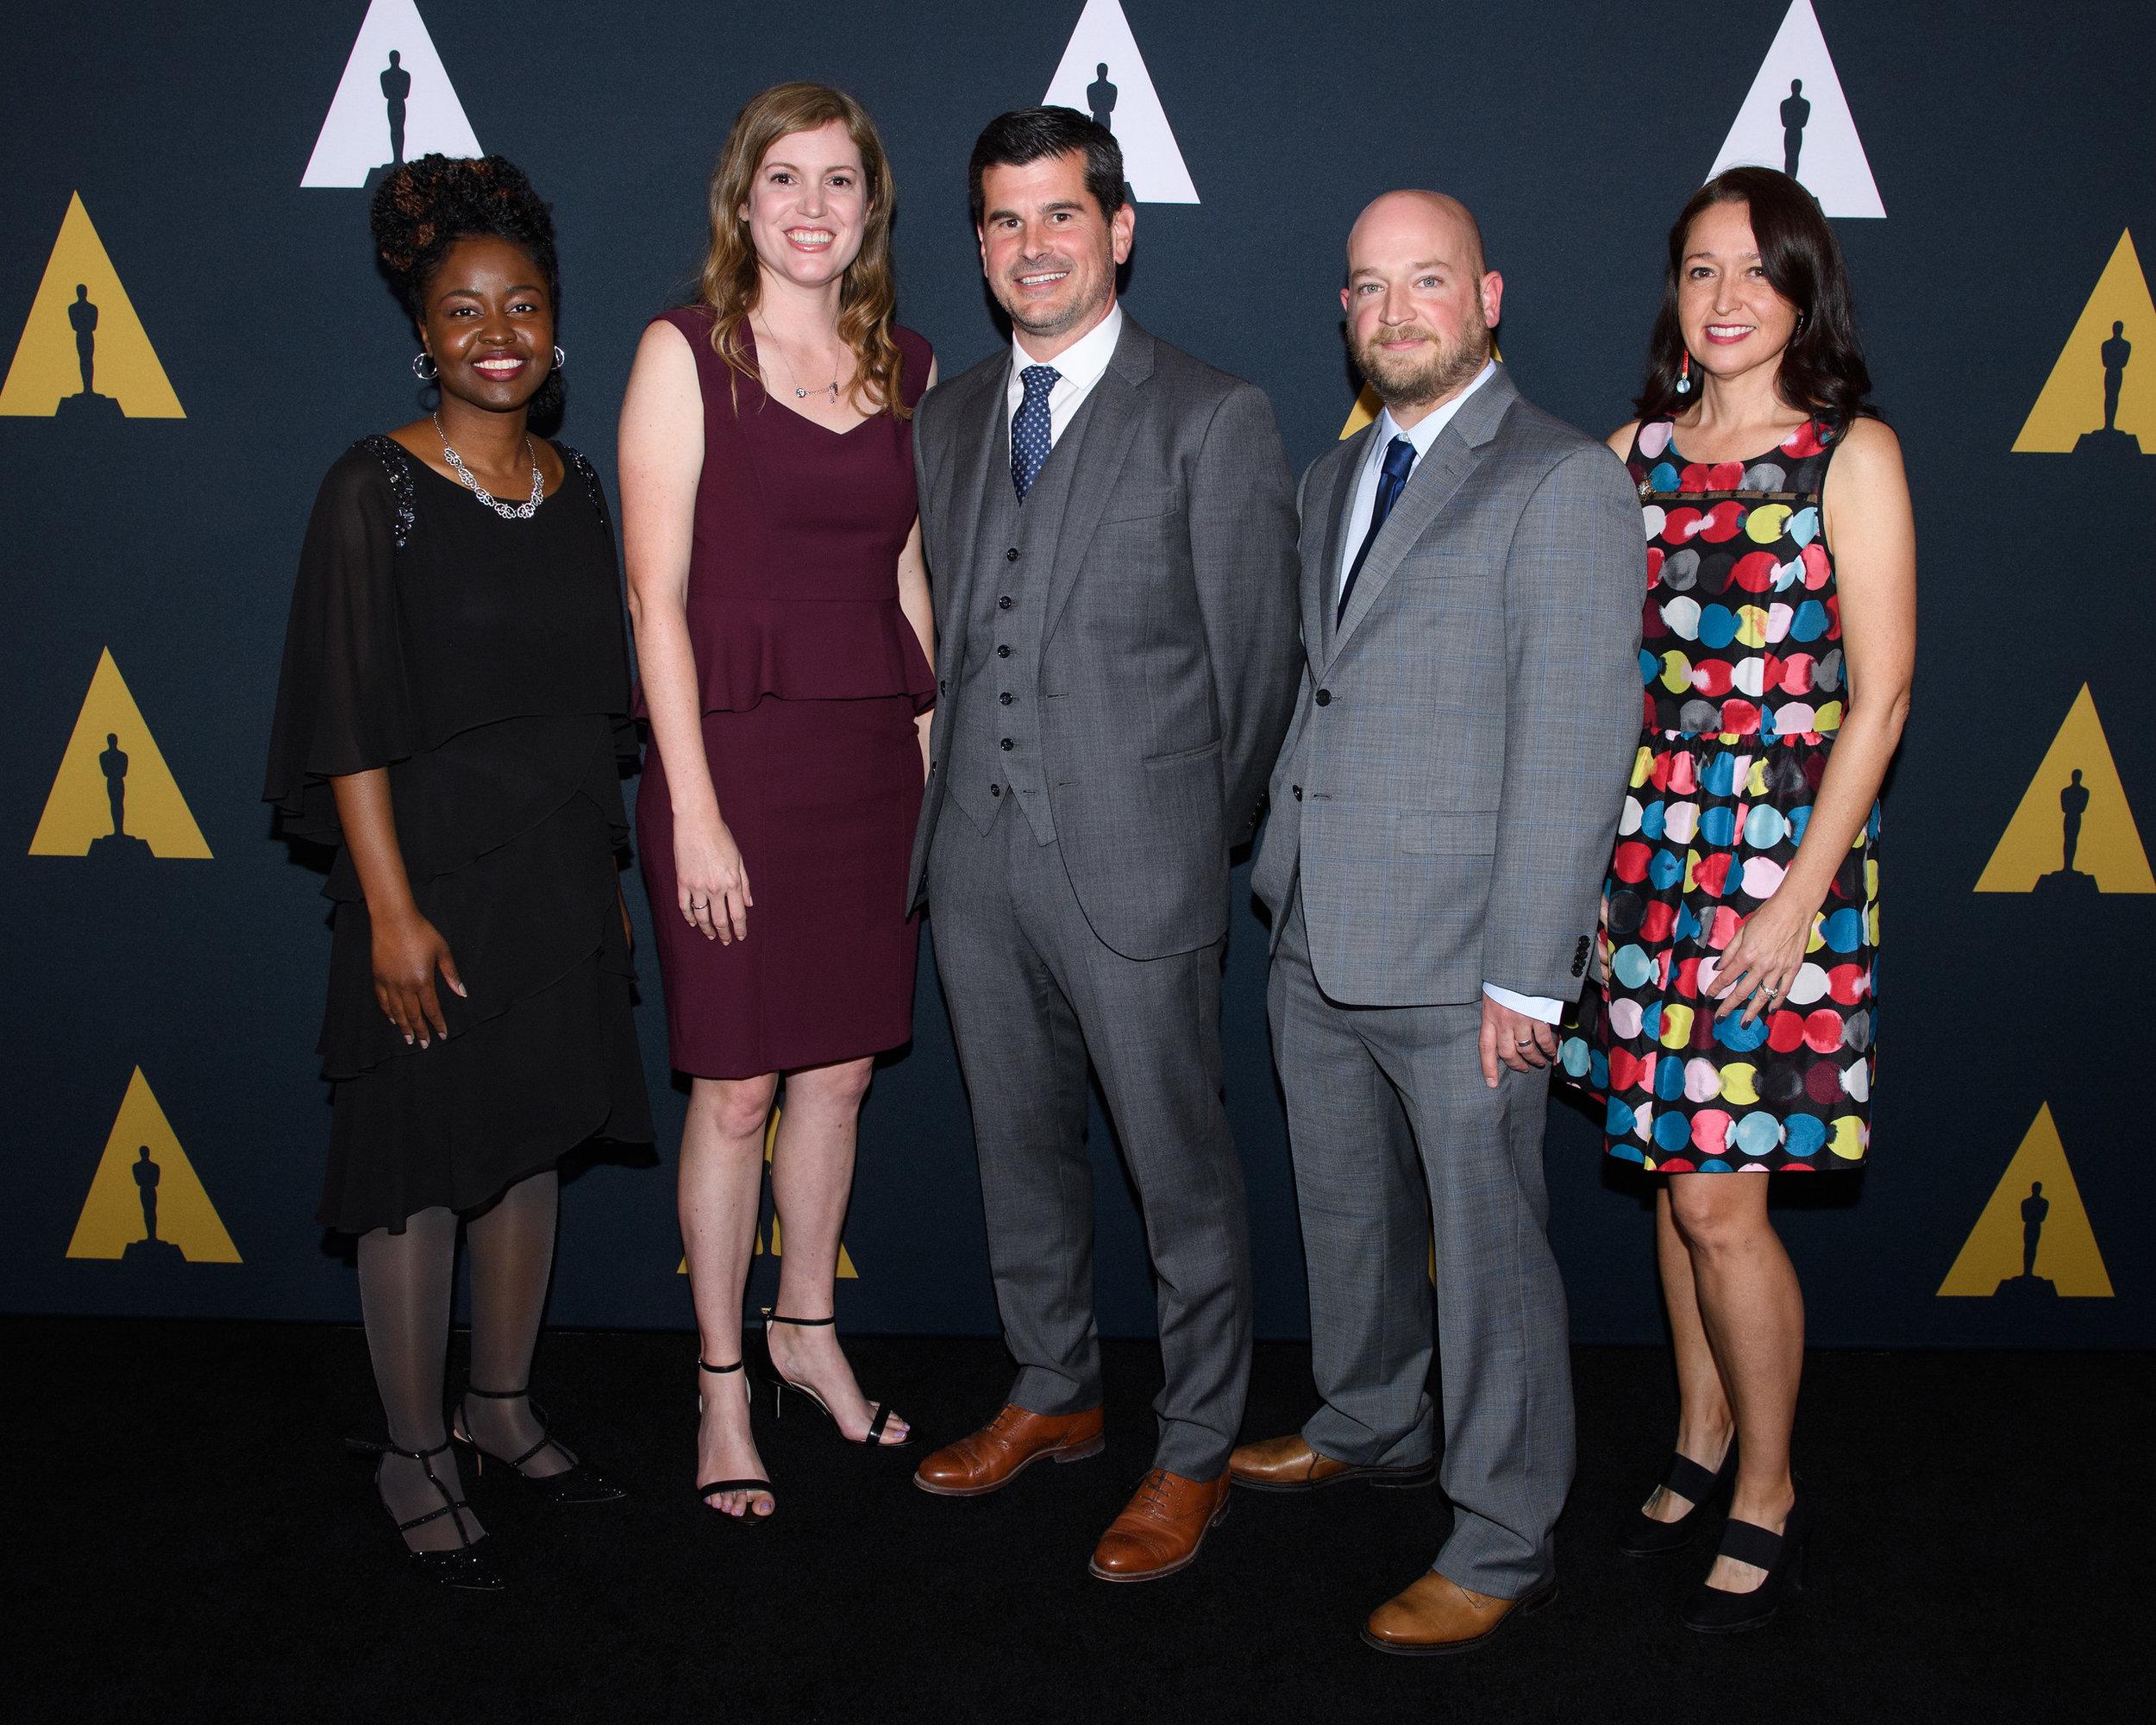 2018 Academy Nicholl Fellows - Grace Sherman, Allison Buckmelter, Nicolas Buckmelter, Joey Clarke, Jr., Wenonah Wilms